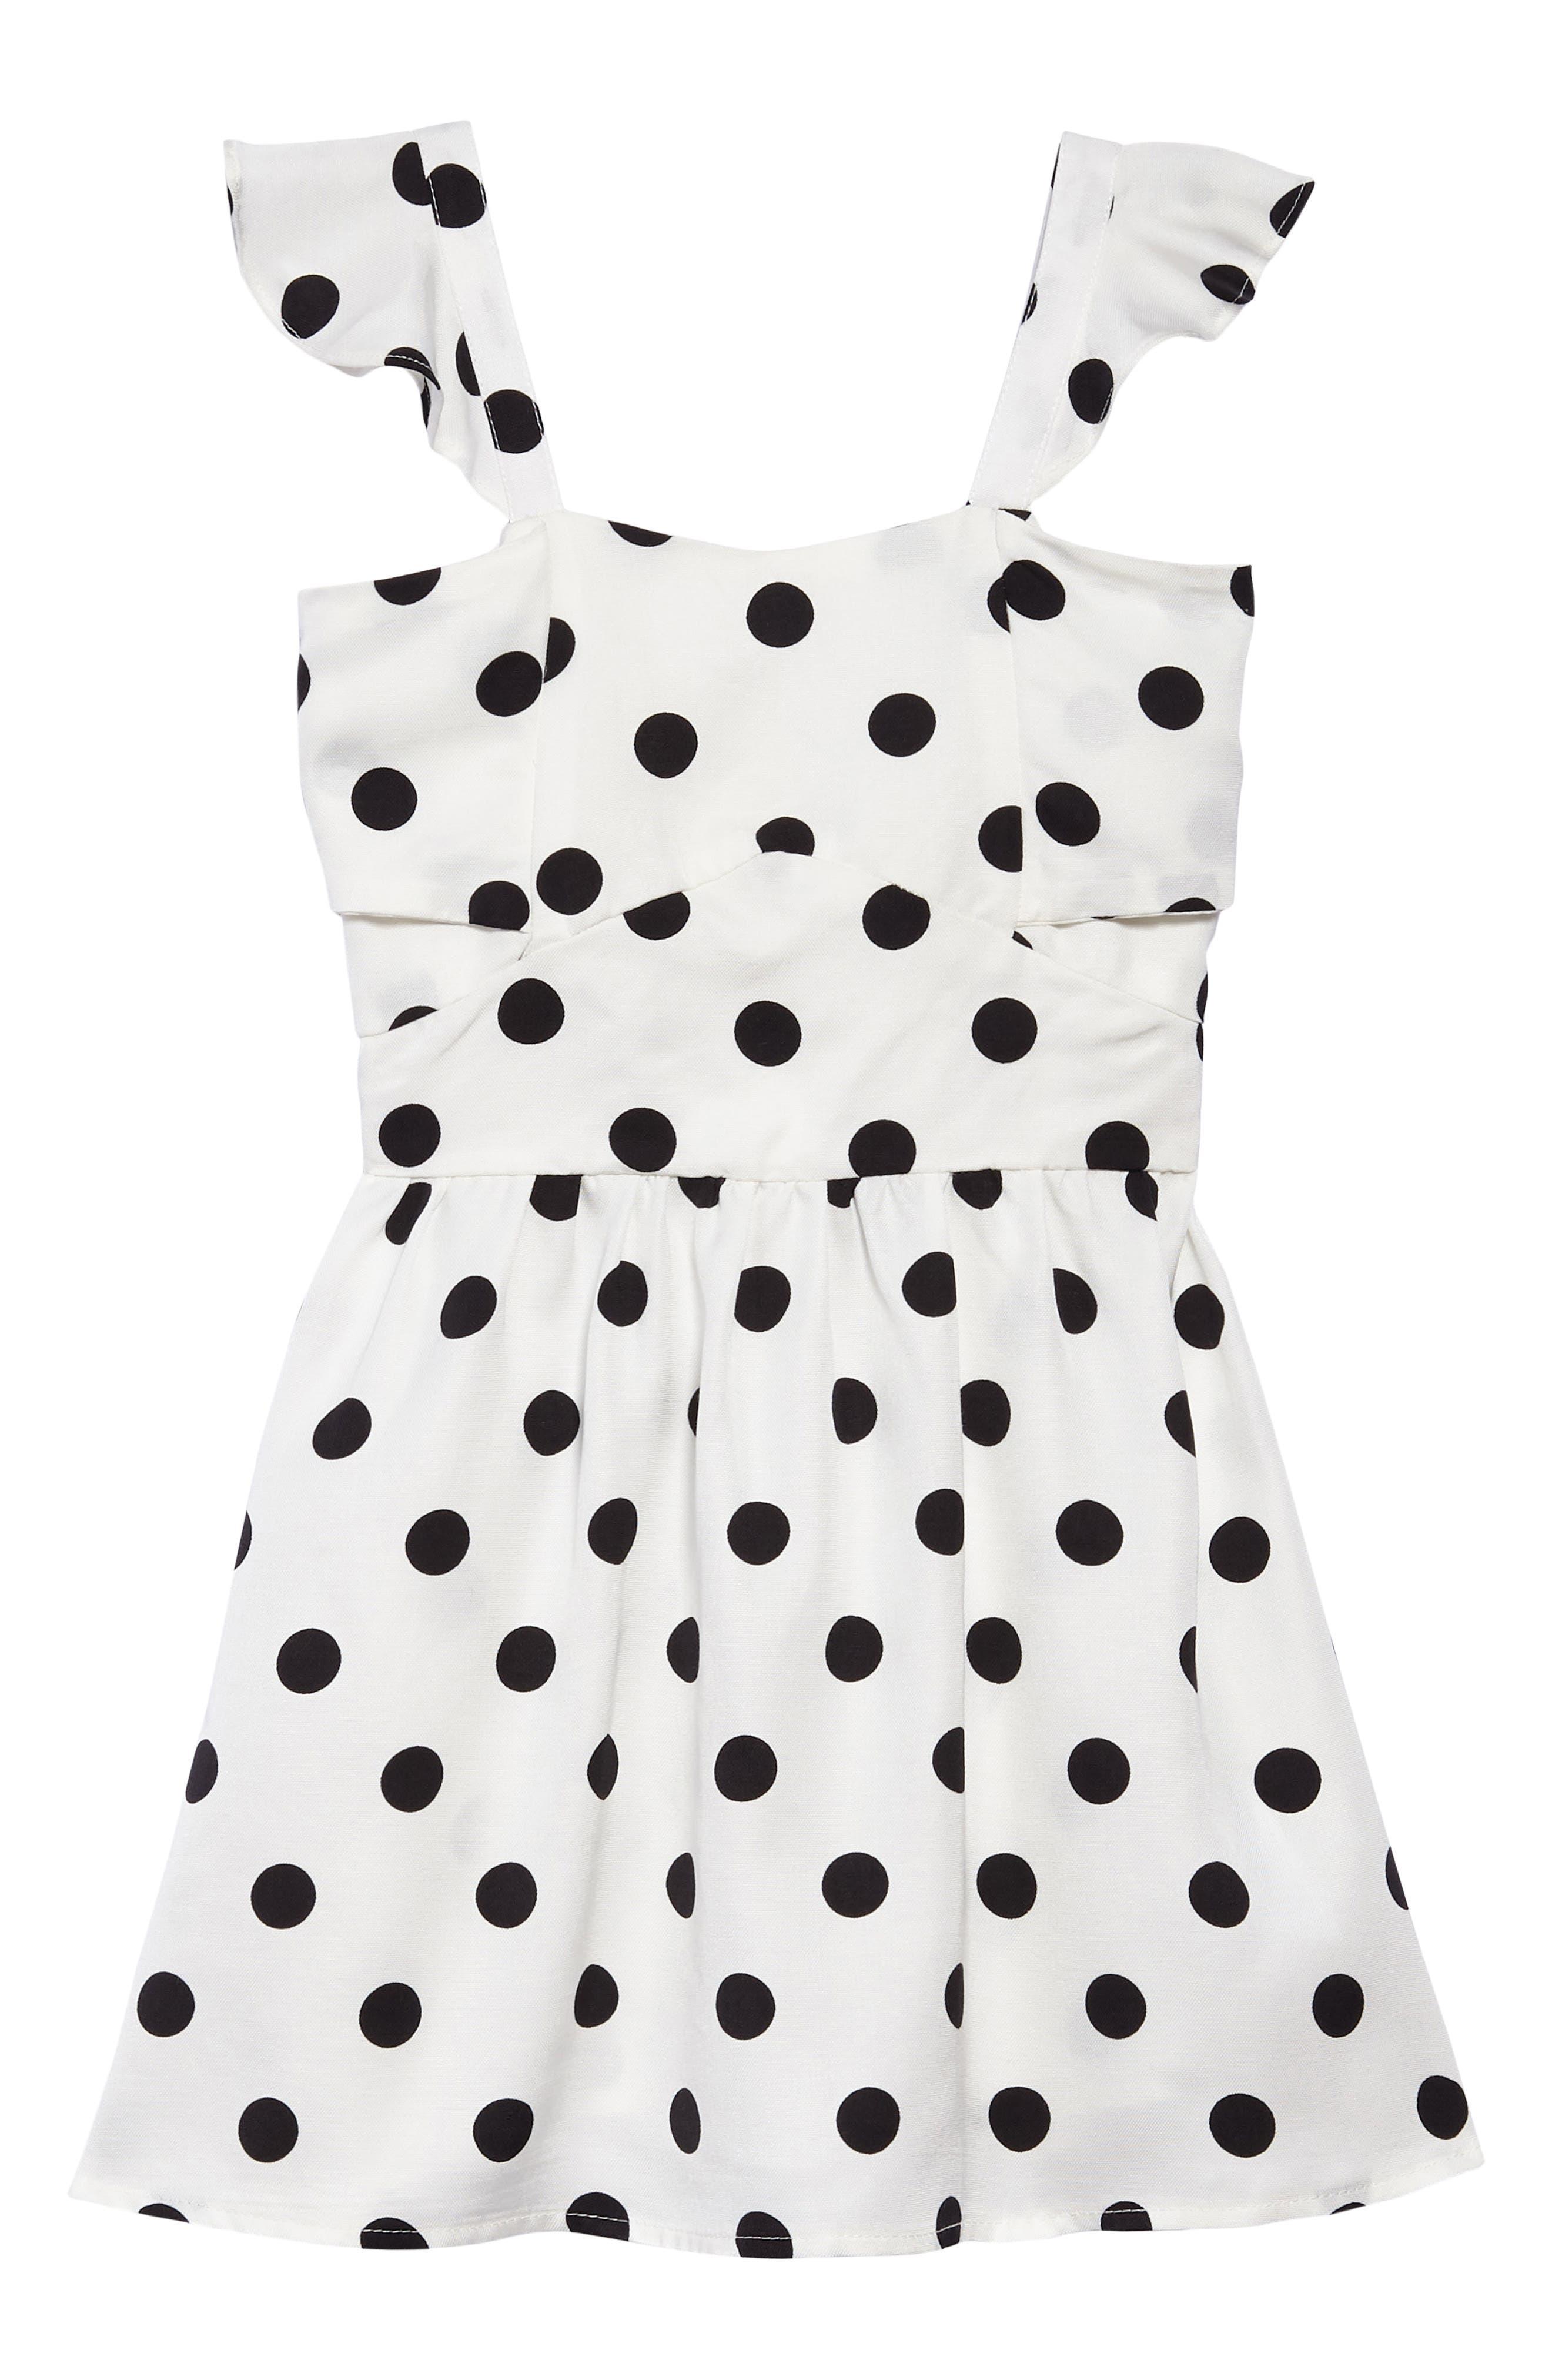 Polka Dot Dress,                             Main thumbnail 1, color,                             White Spot